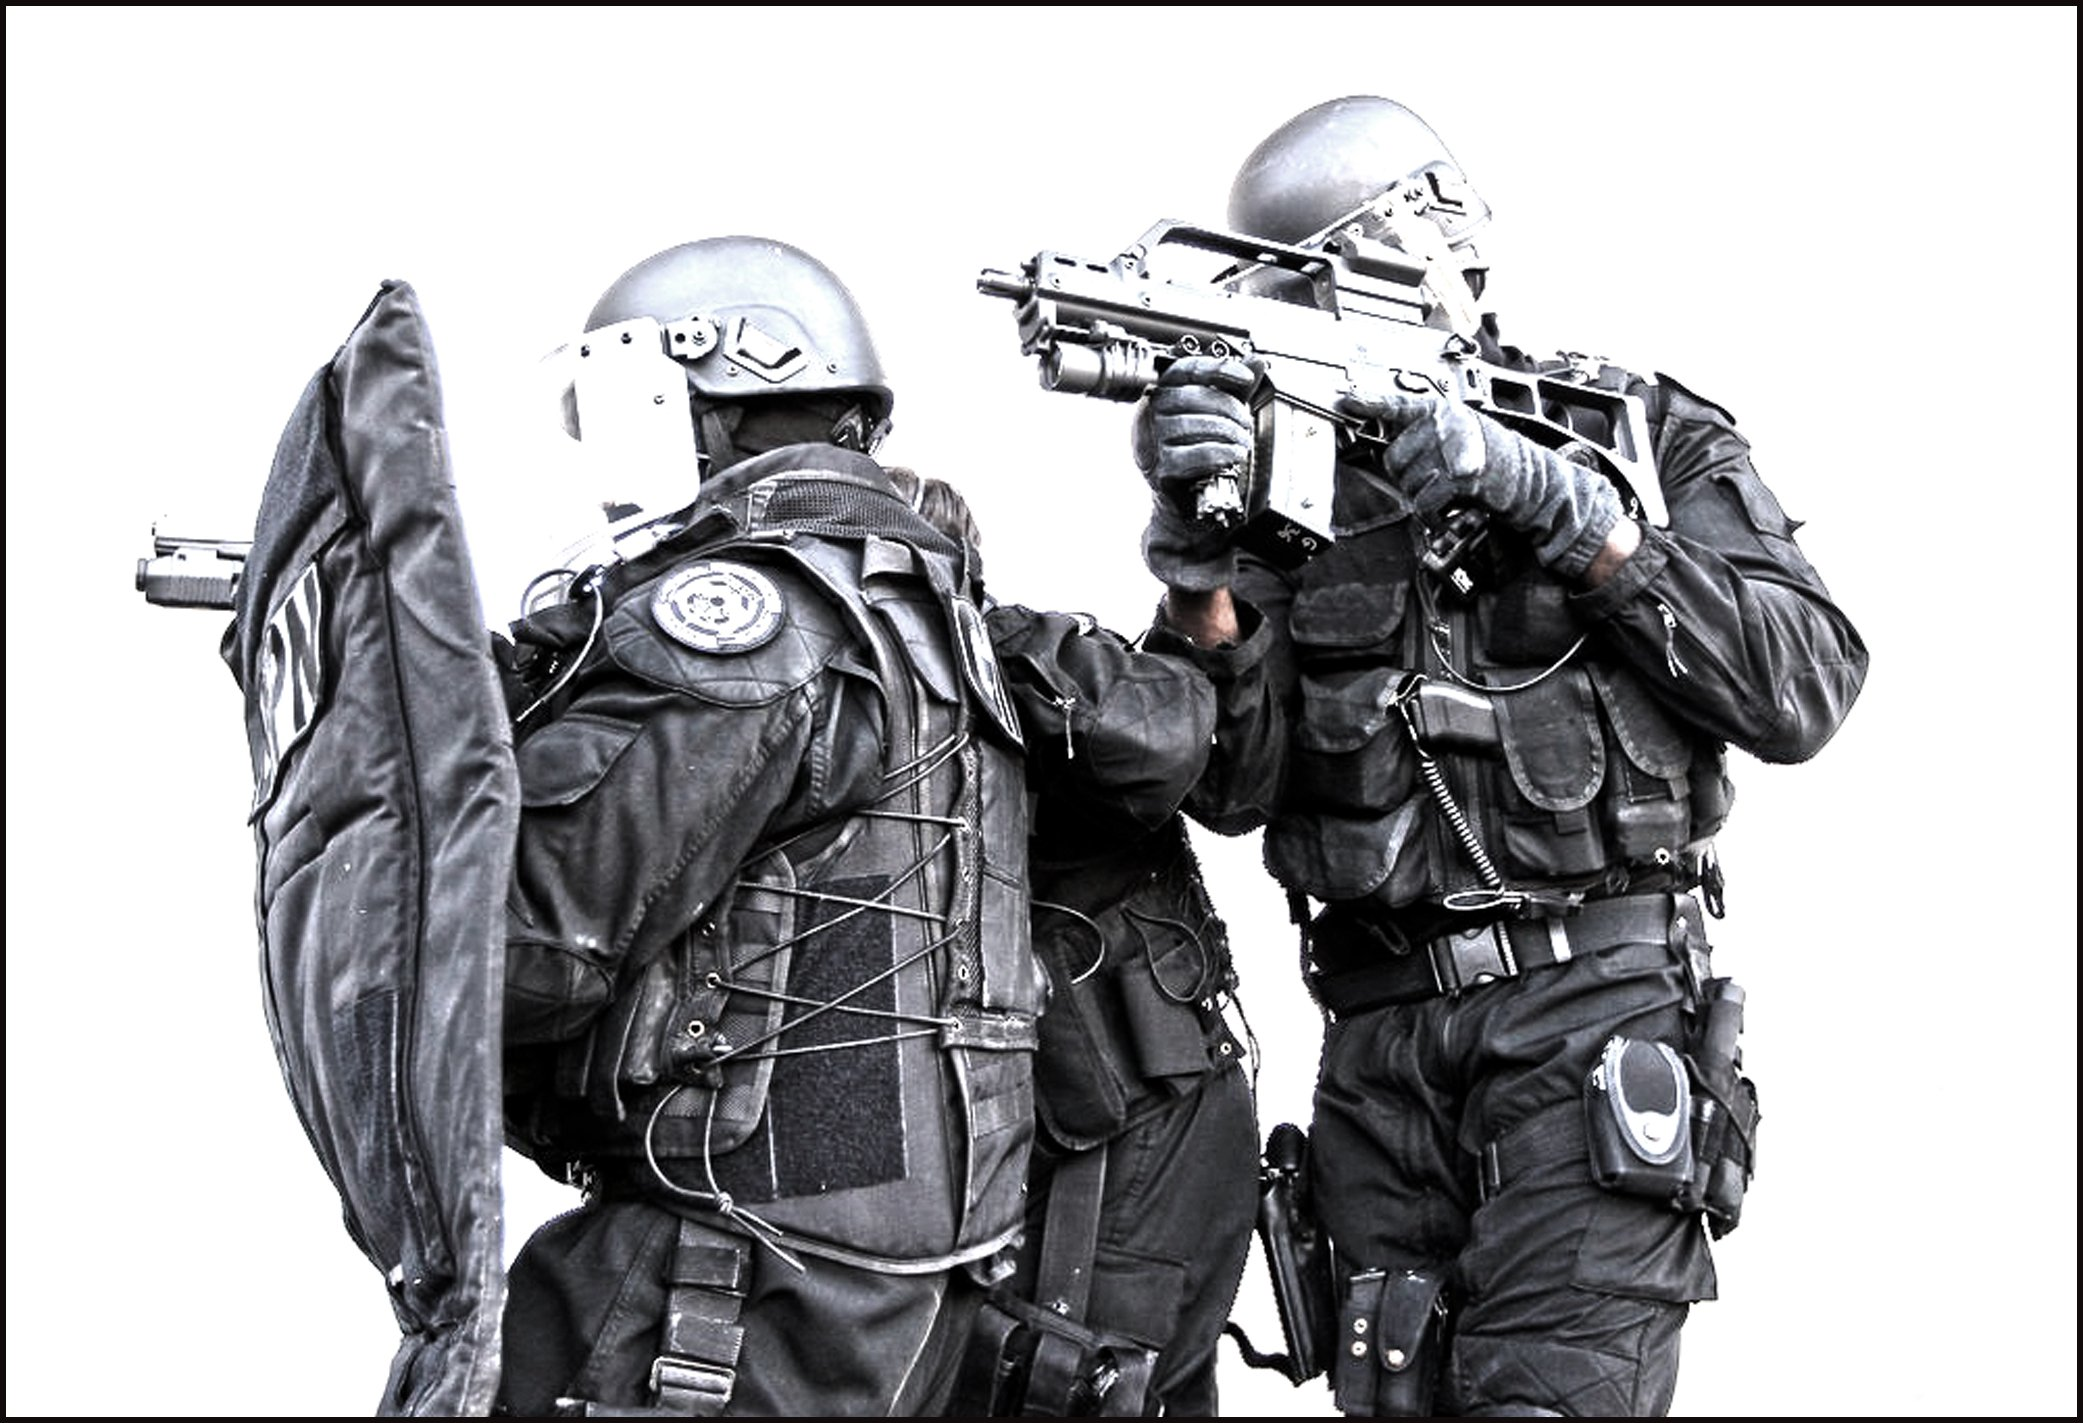 SWAT TEAM police crime emergency weapon gun wallpaper background 2083x1423